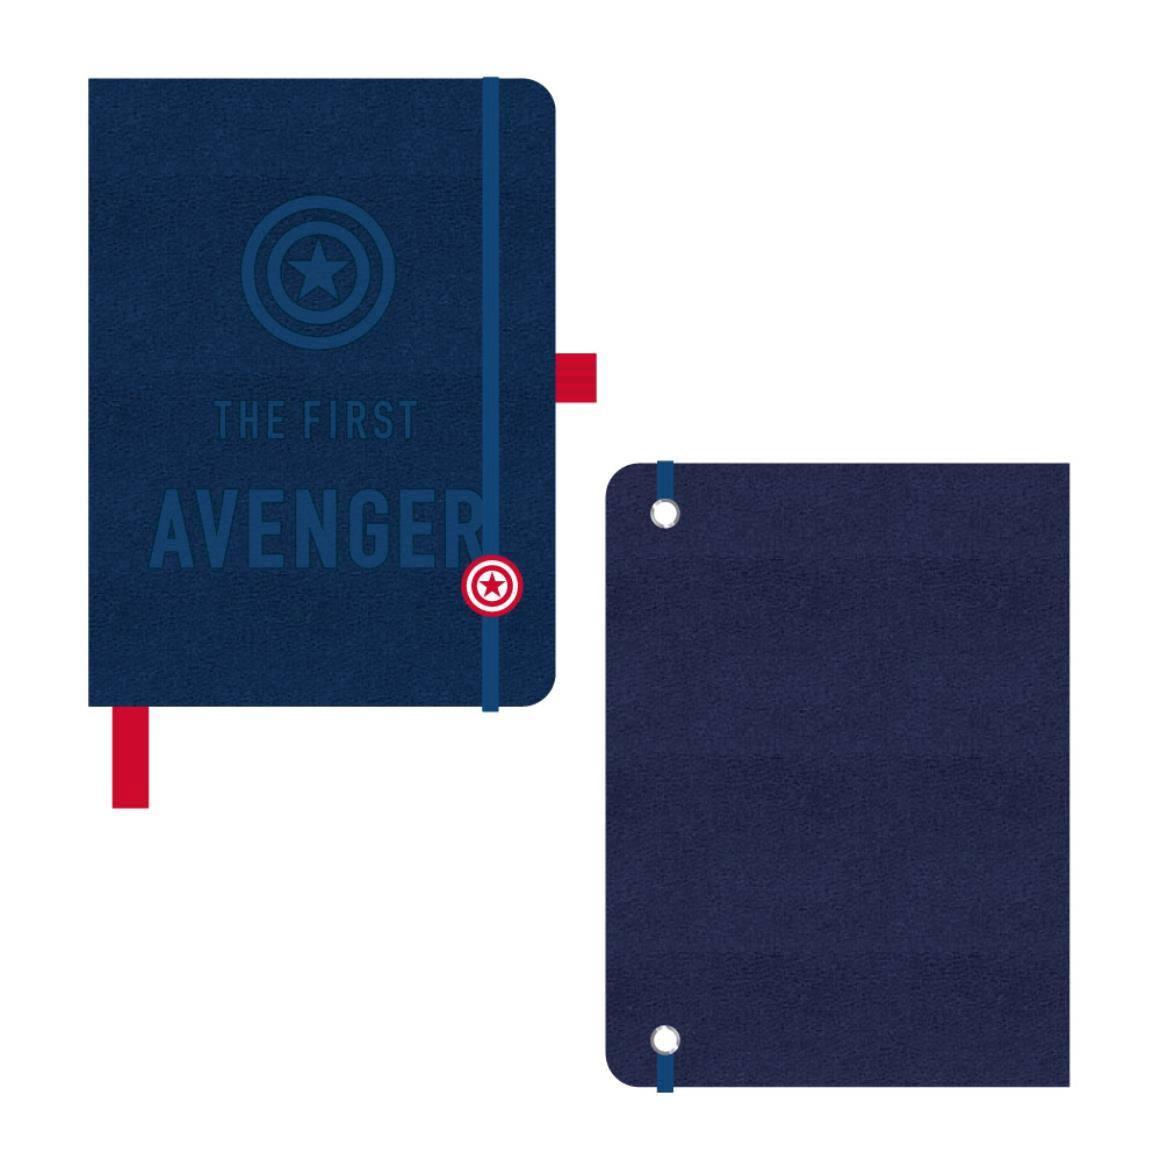 Marvel Premium Notebook A5 The First Avenger